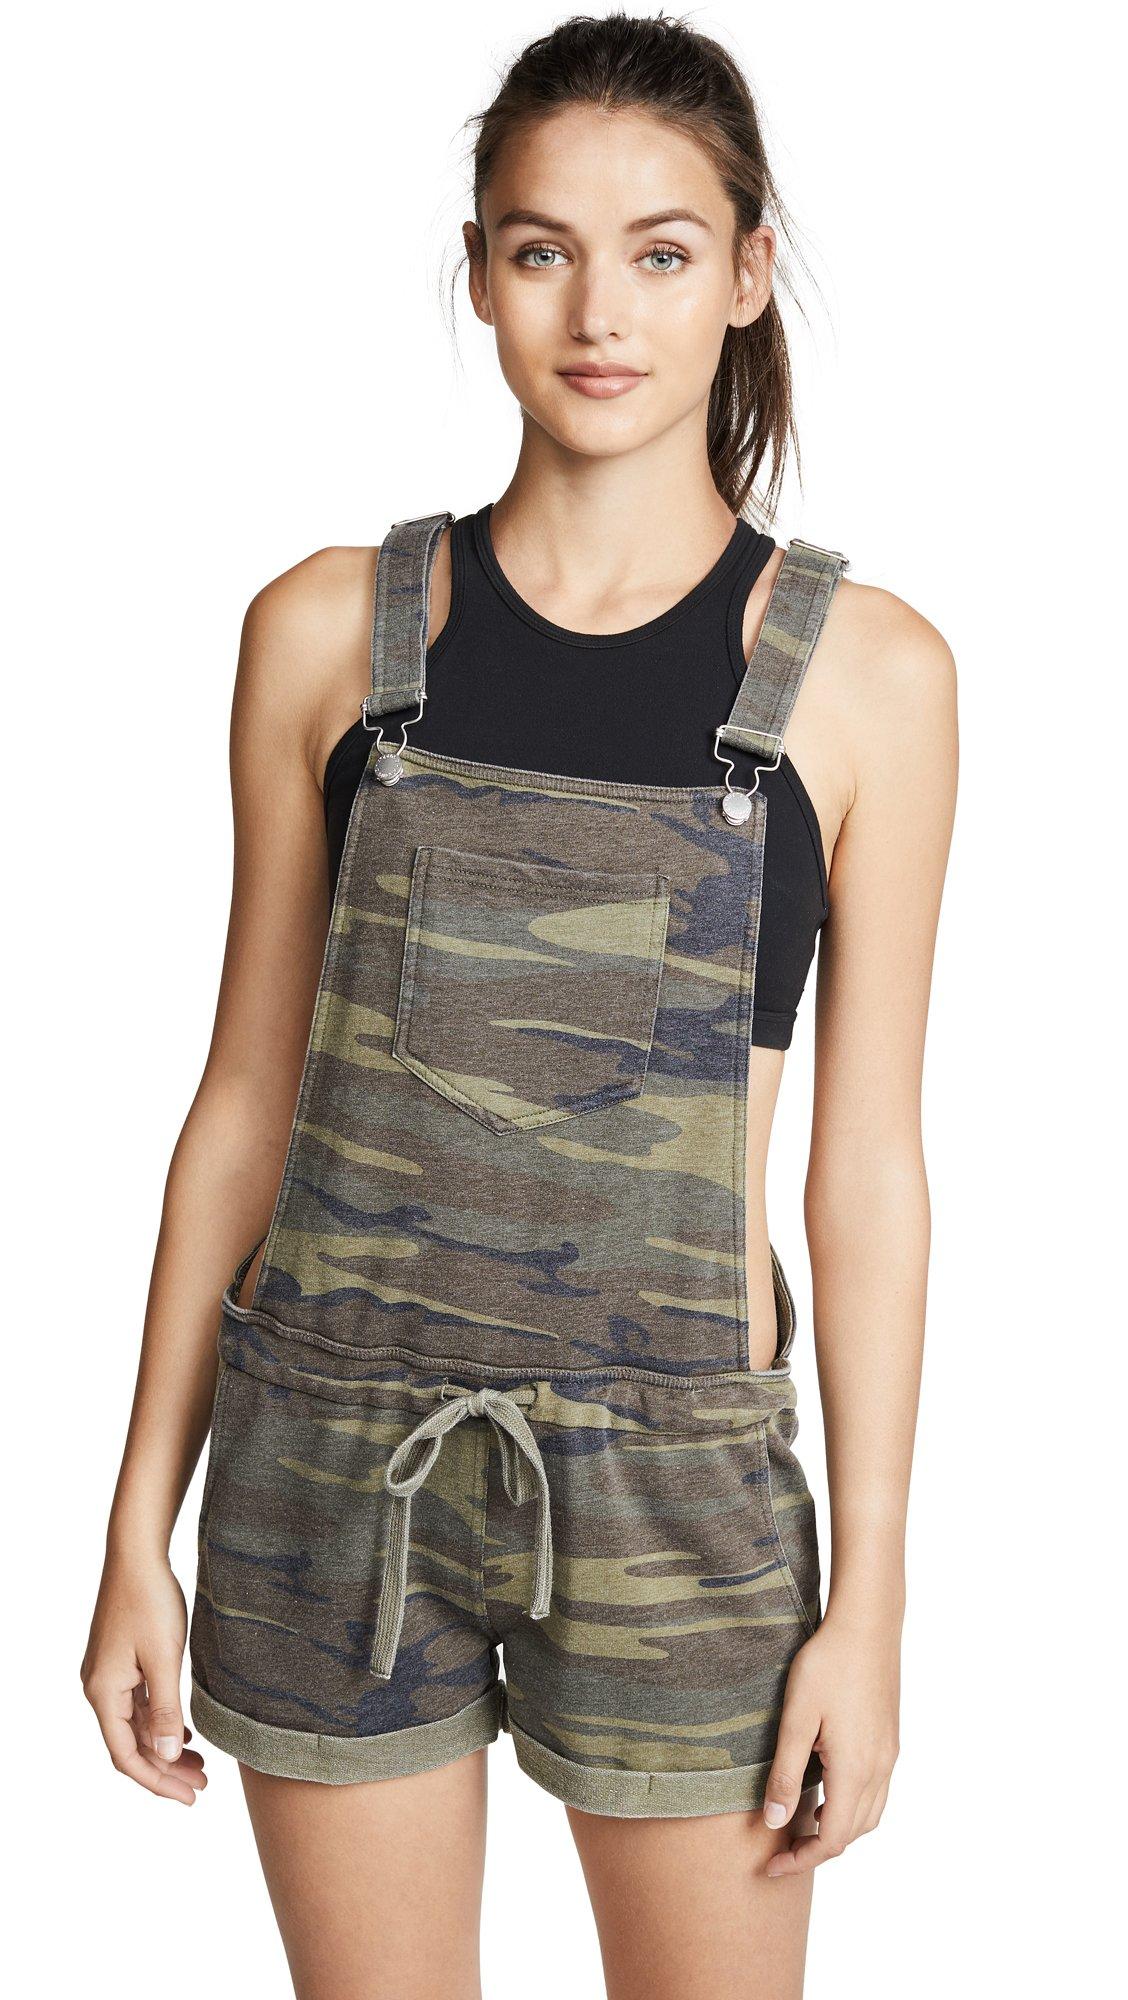 Z SUPPLY Women's The Camo Short Overalls, Camo Green, Small